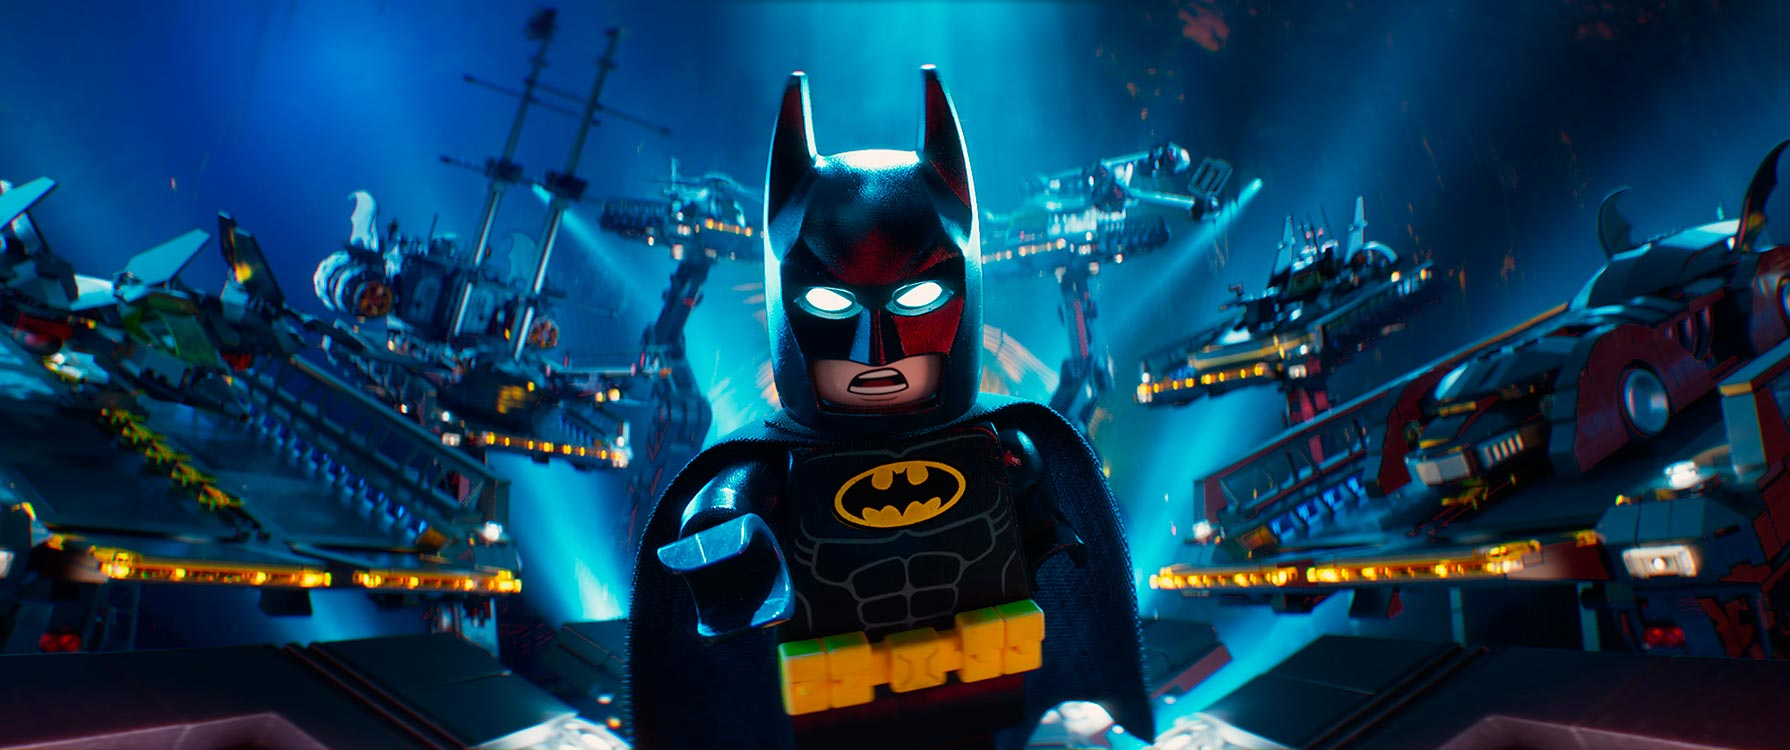 04 LEGO Batman